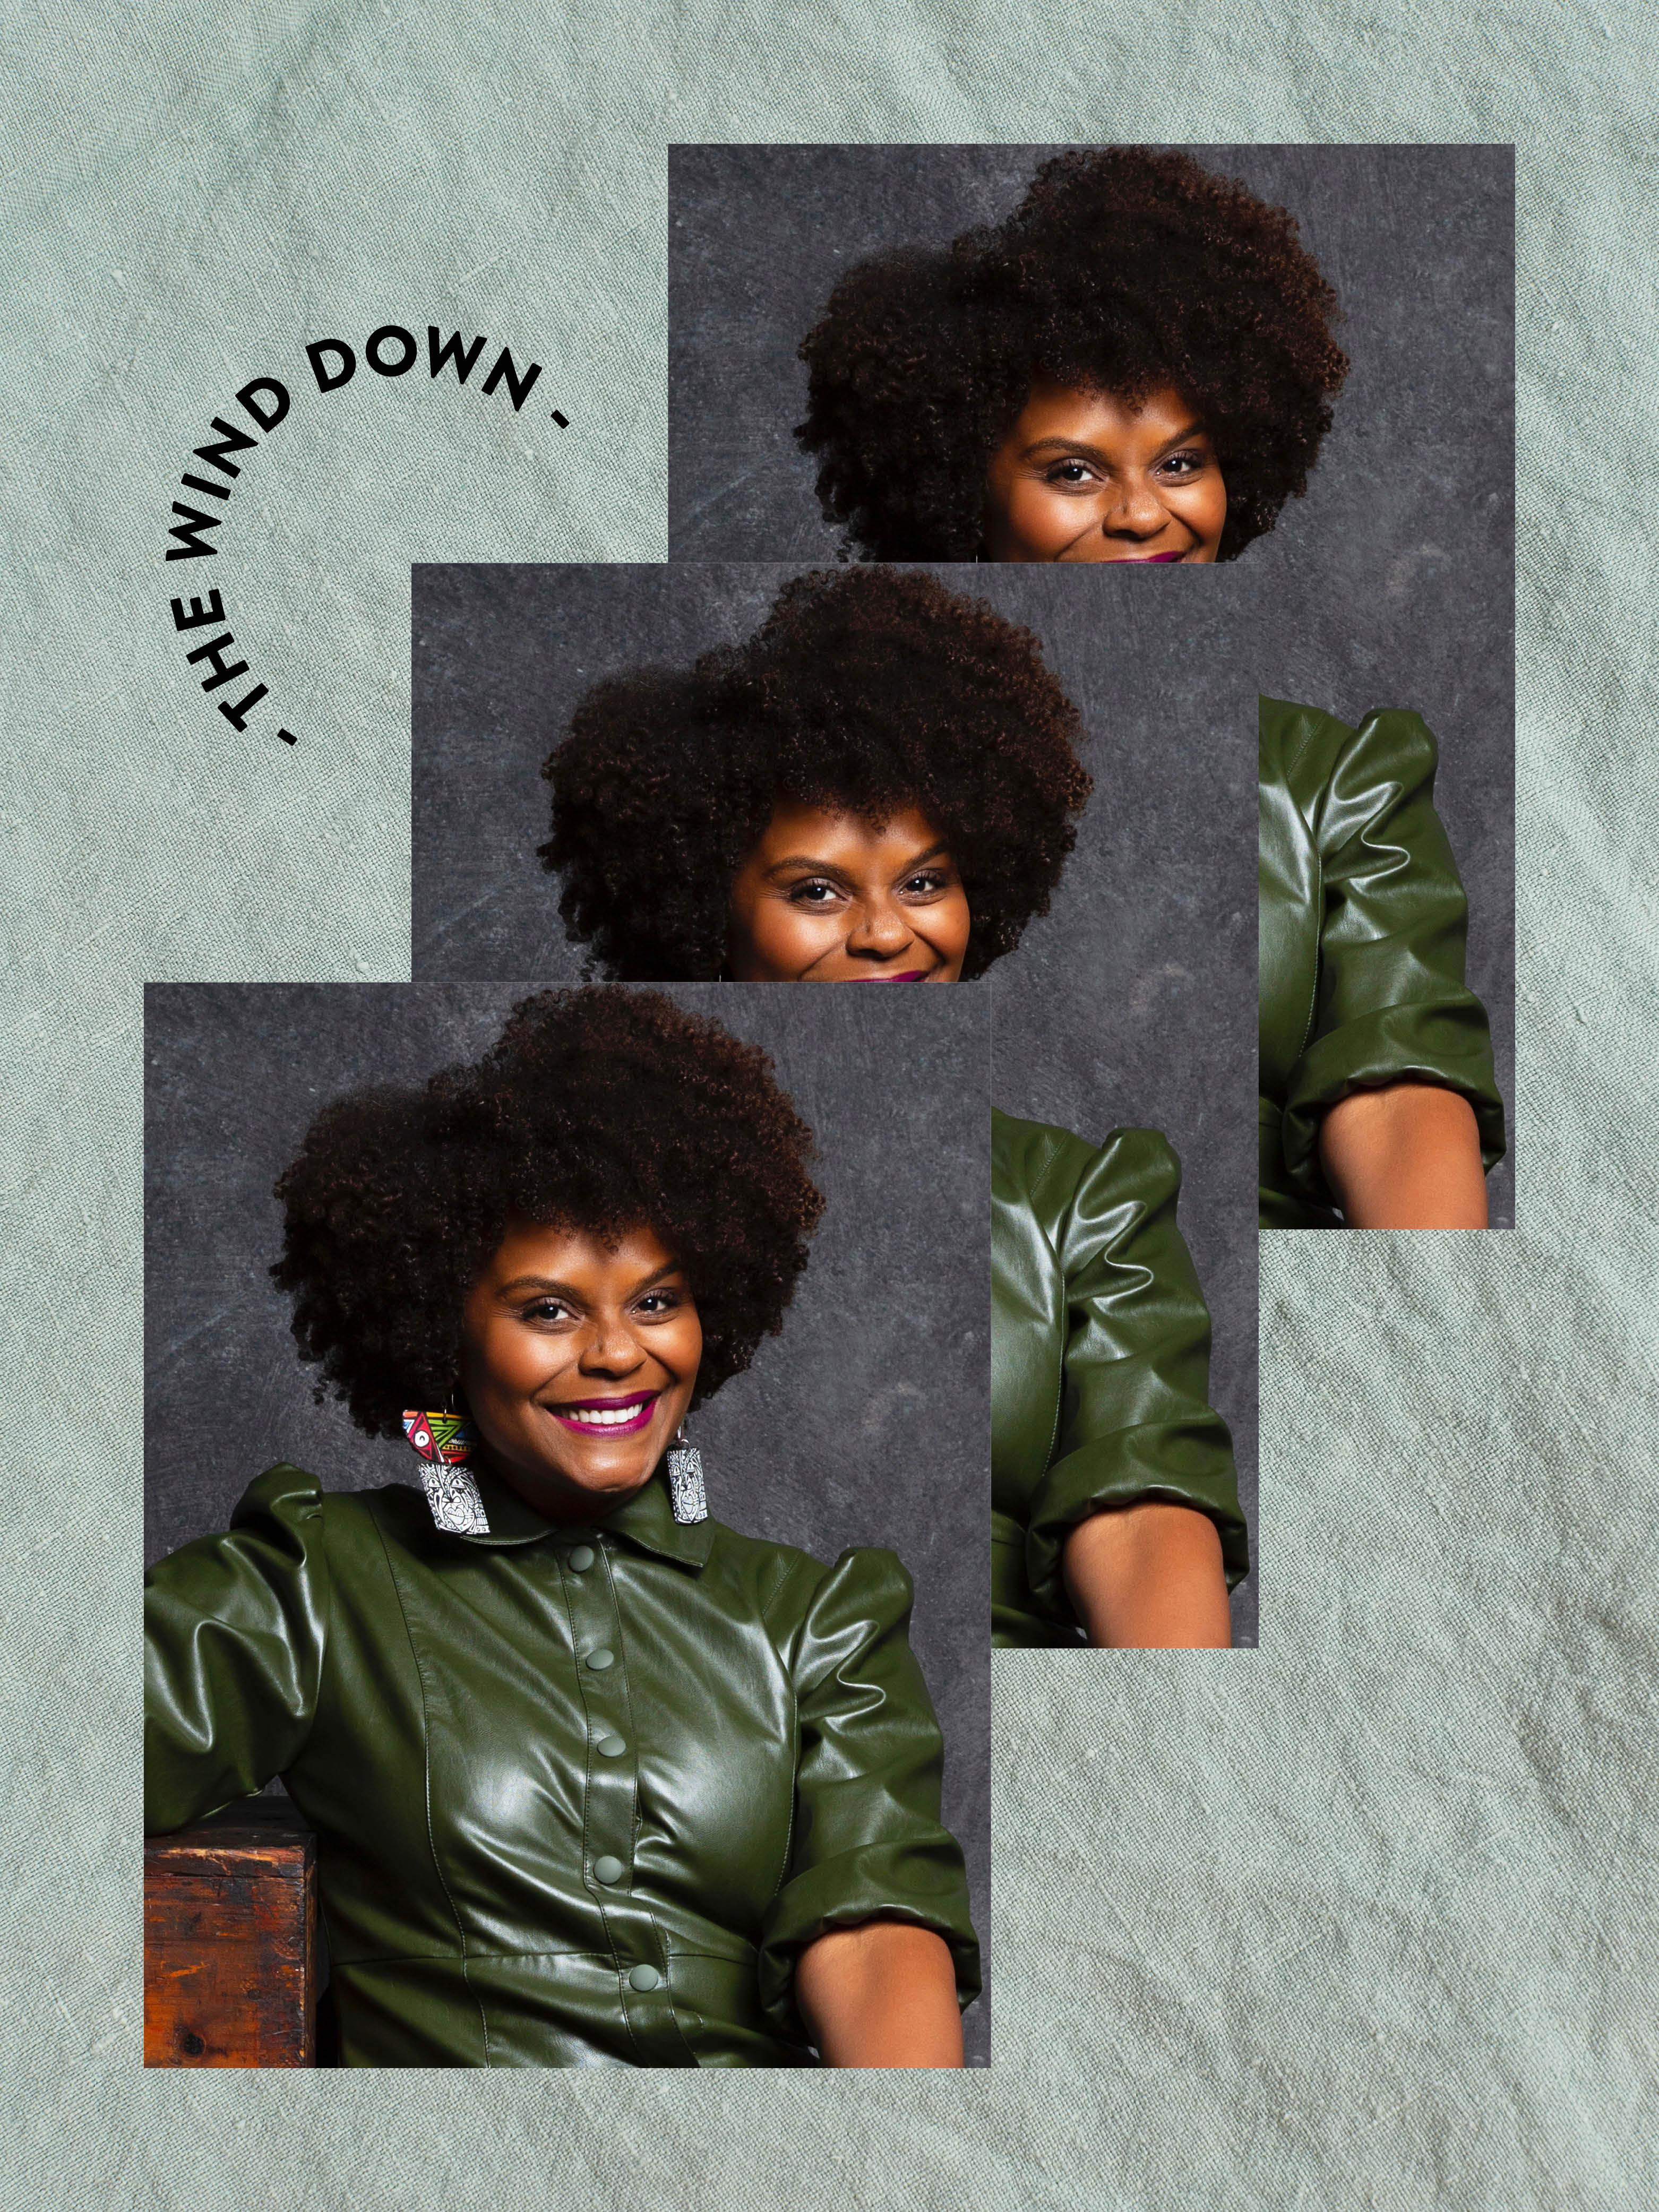 tabitha-brown-wind-down-domino